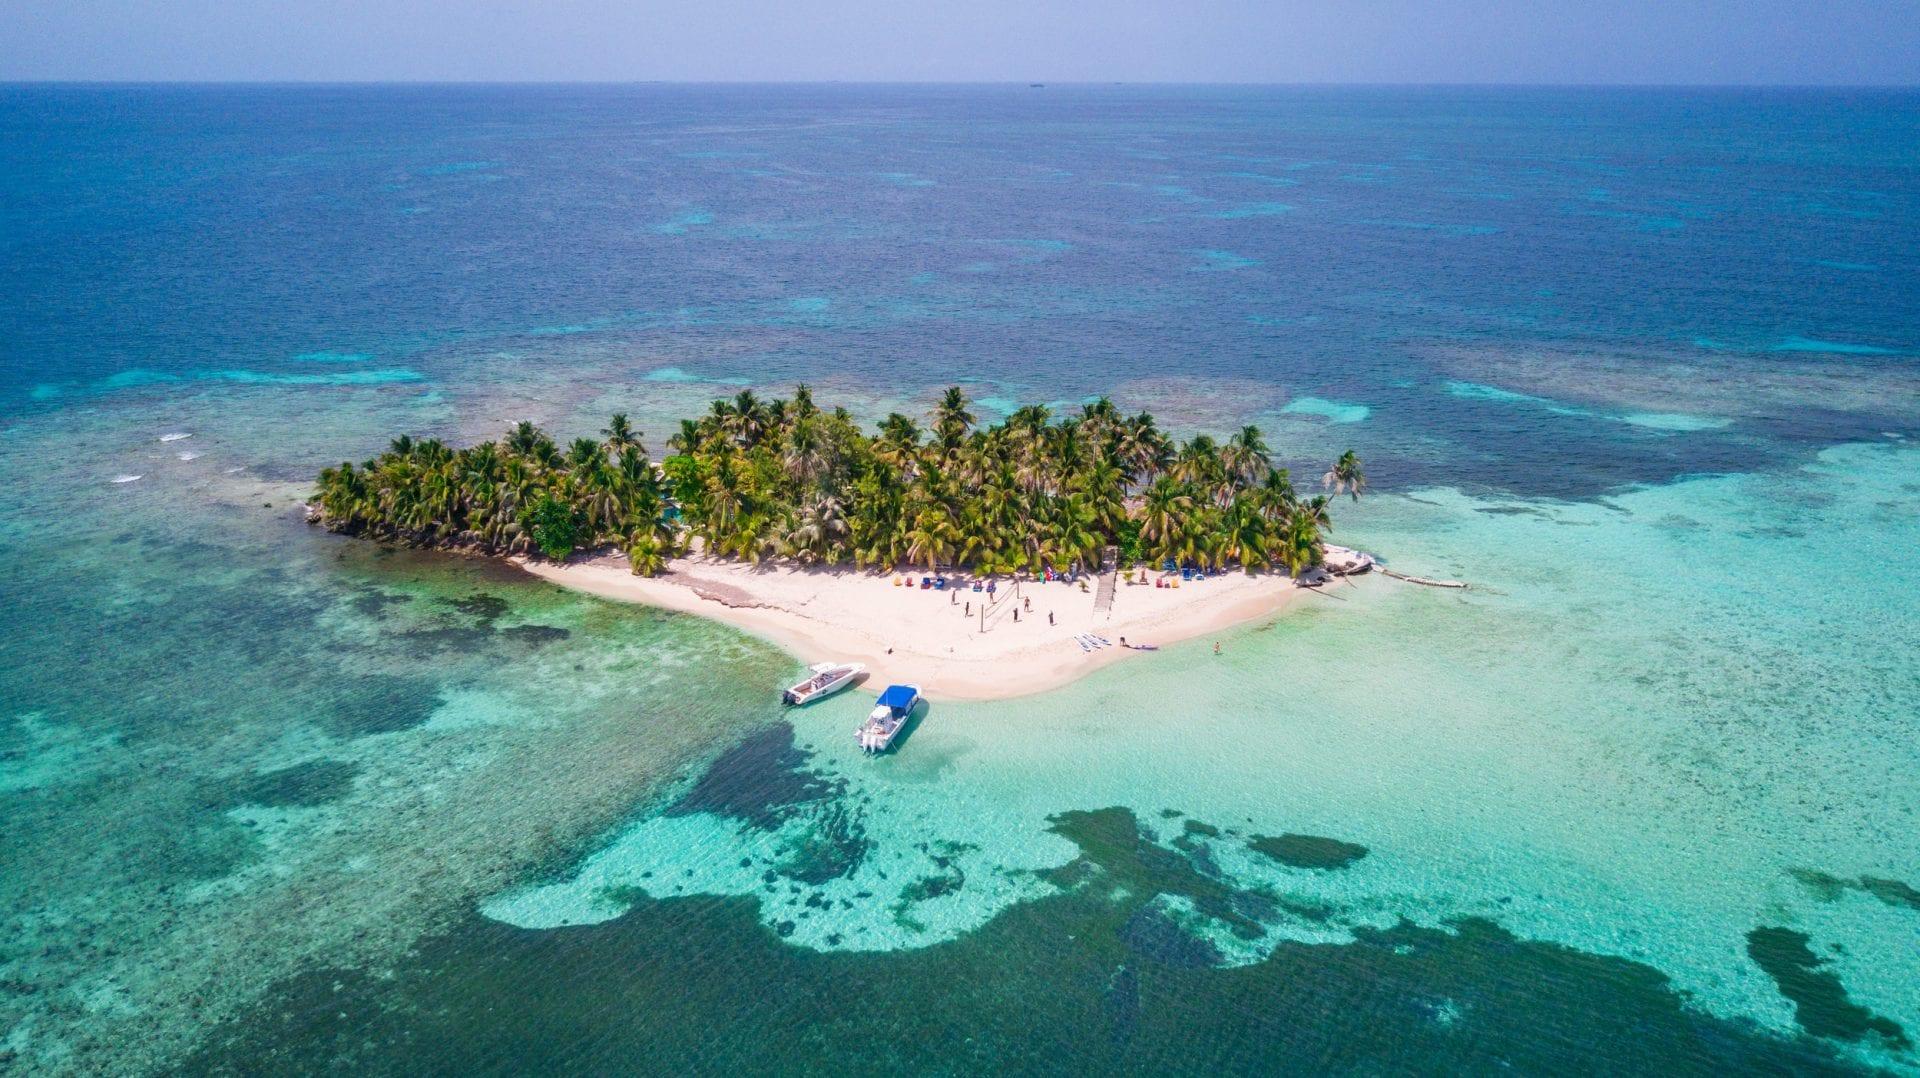 Ranguana Caye caribbean island aerial